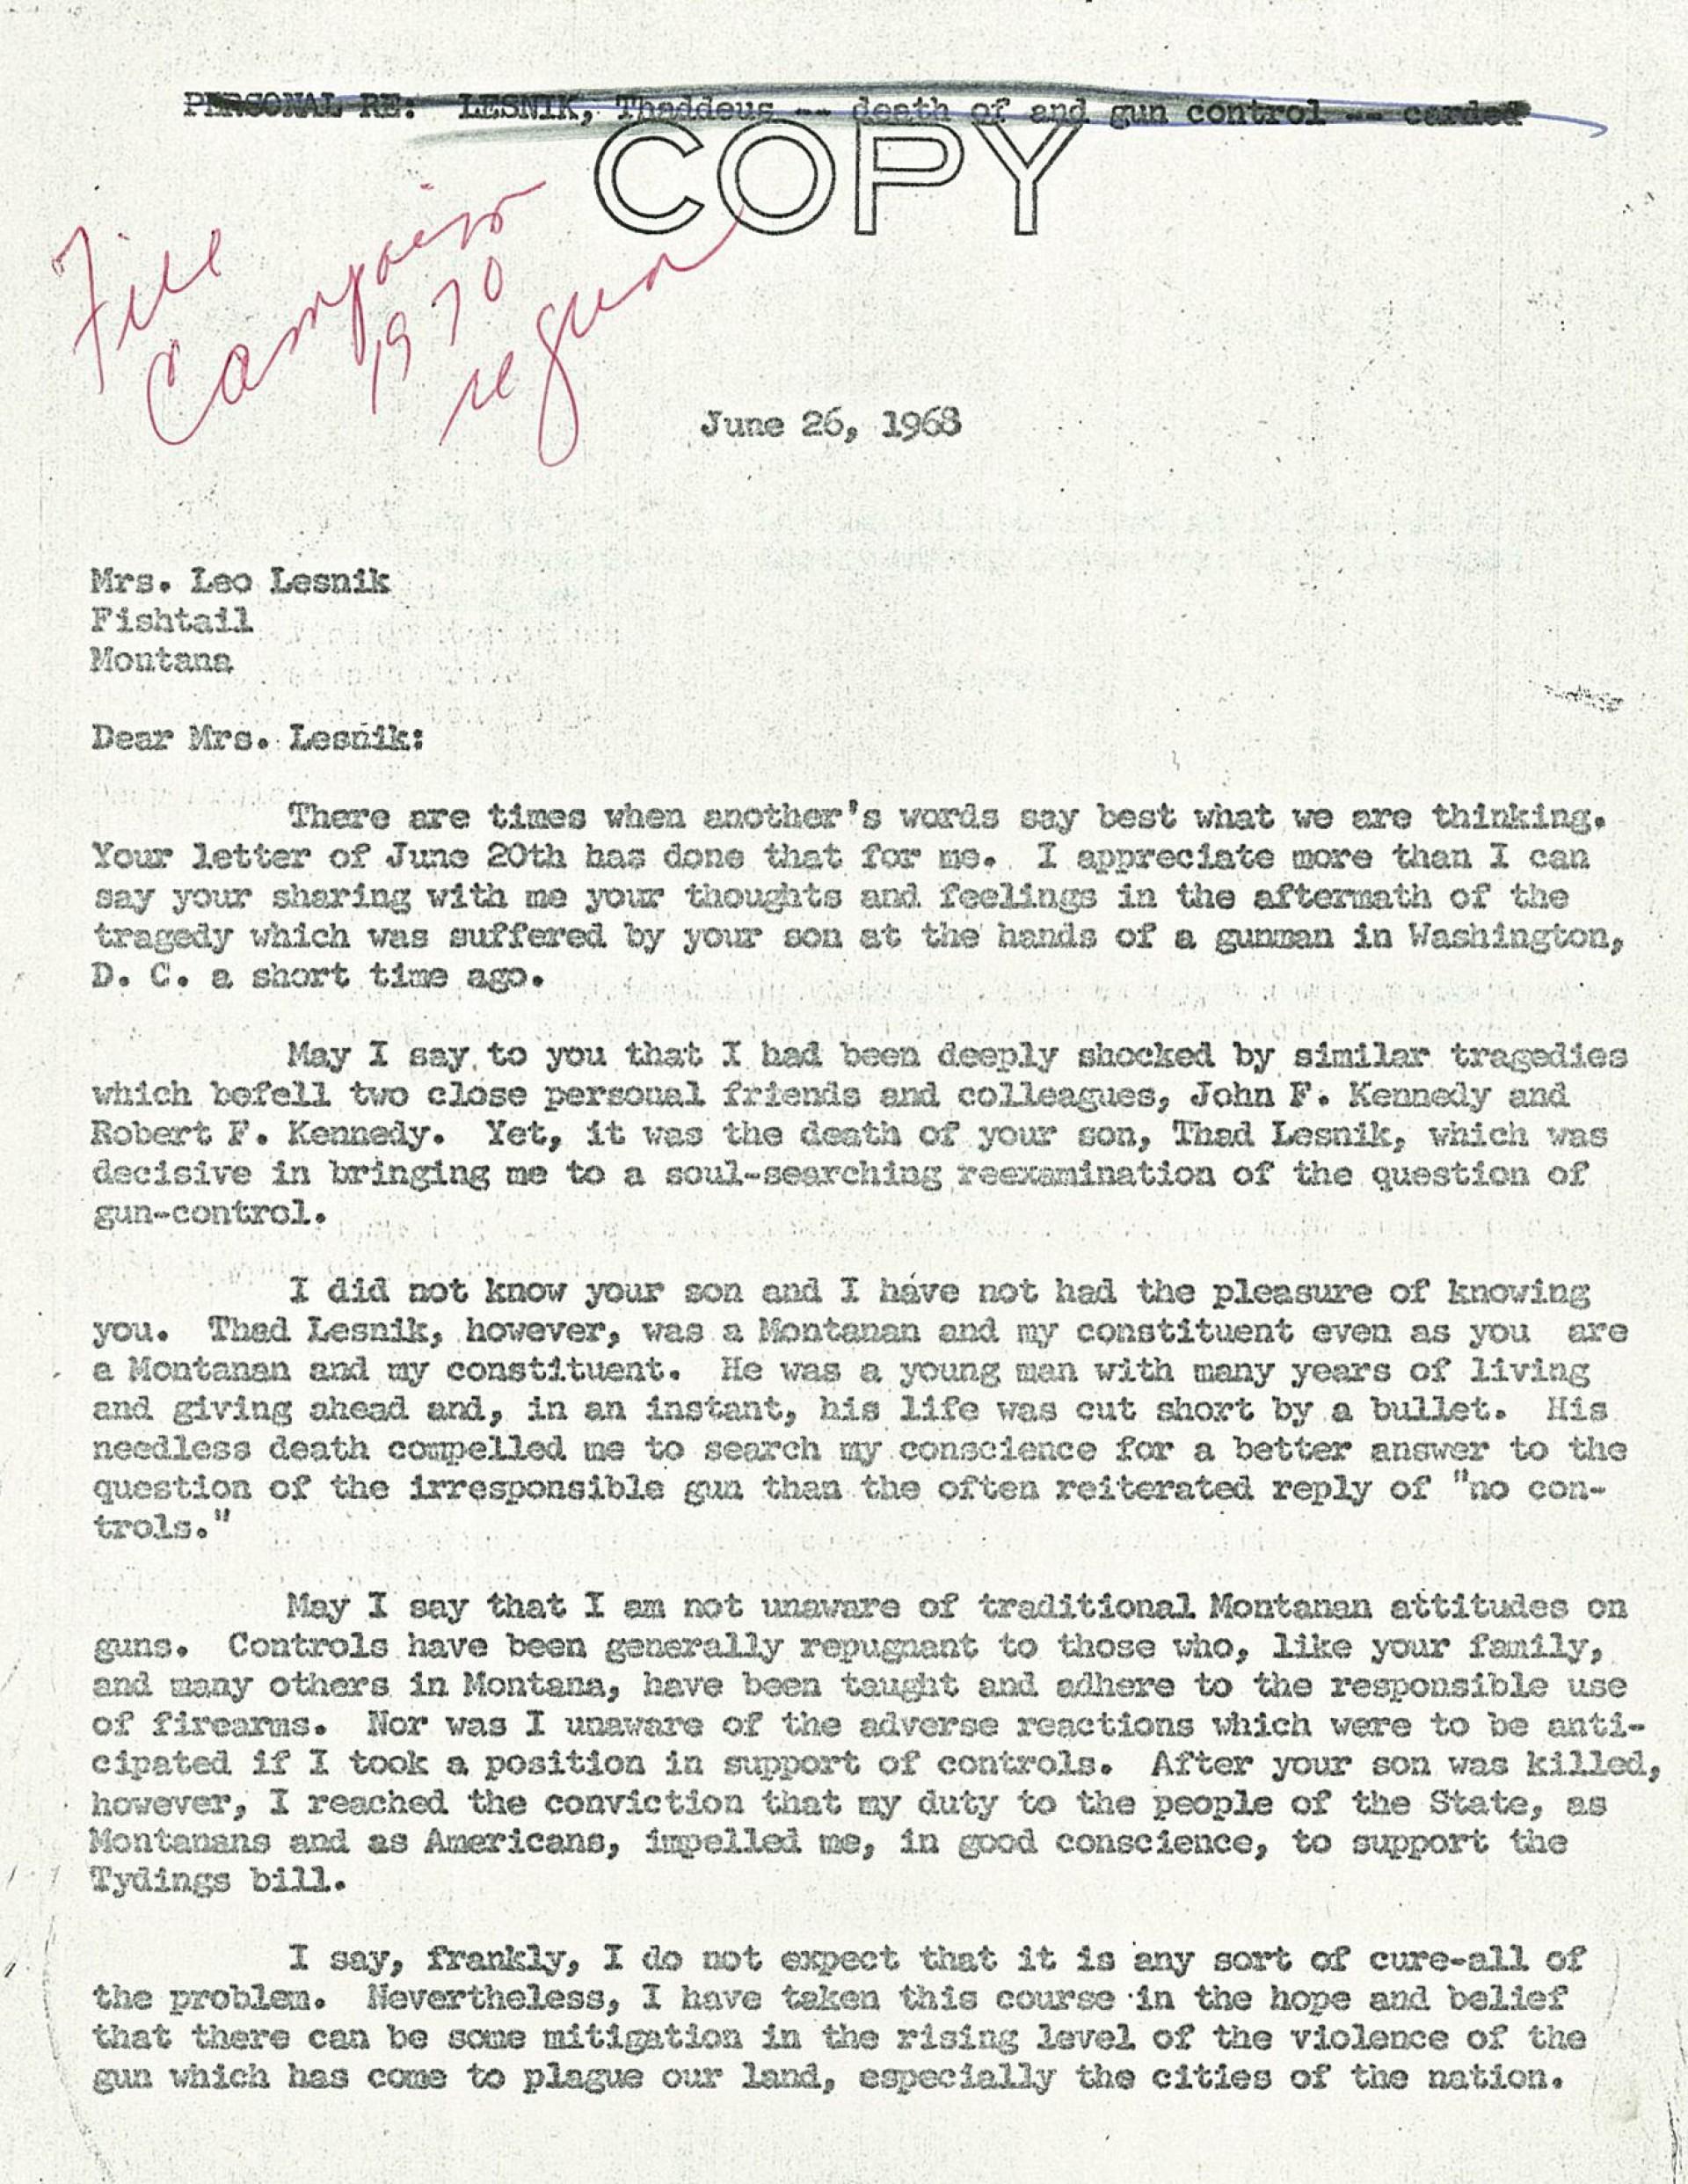 004 Gun Control Argumentative Essay Pro Essays Concl Outline Pdf Introduction Conclusion Topics Thesis Anti Against On Incredible Laws Stricter 1920